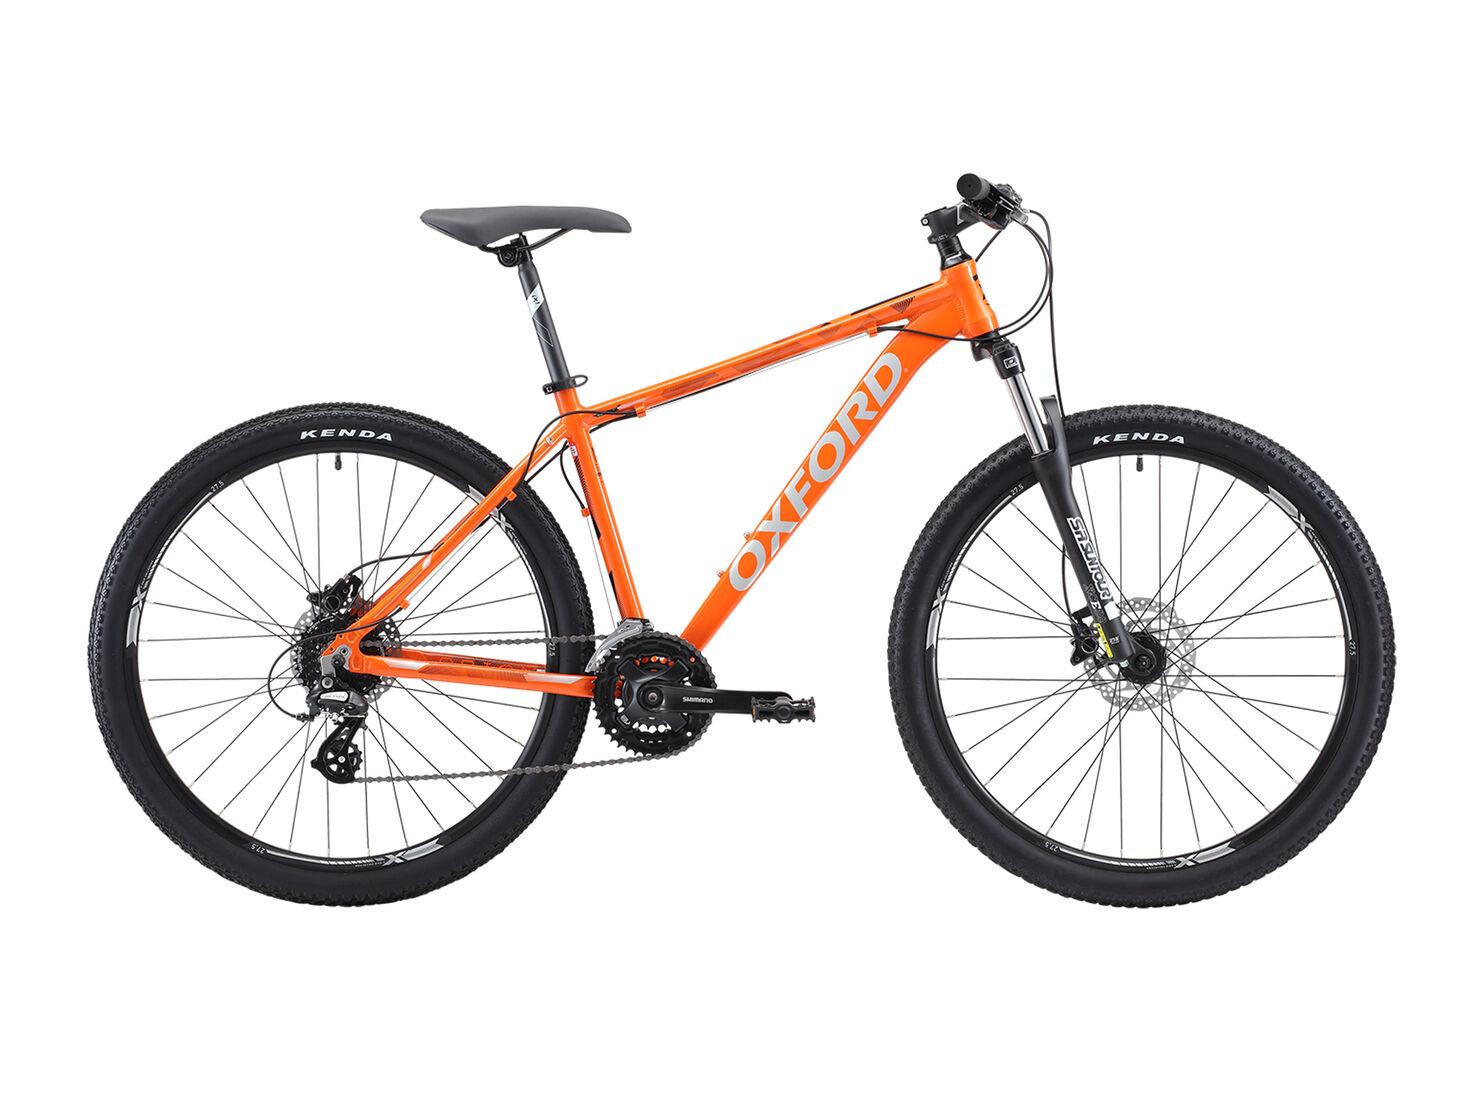 4520def45fb Bicicleta MTB Oxford Orion 2 Aro 27,5 en Mountain Bike | Paris